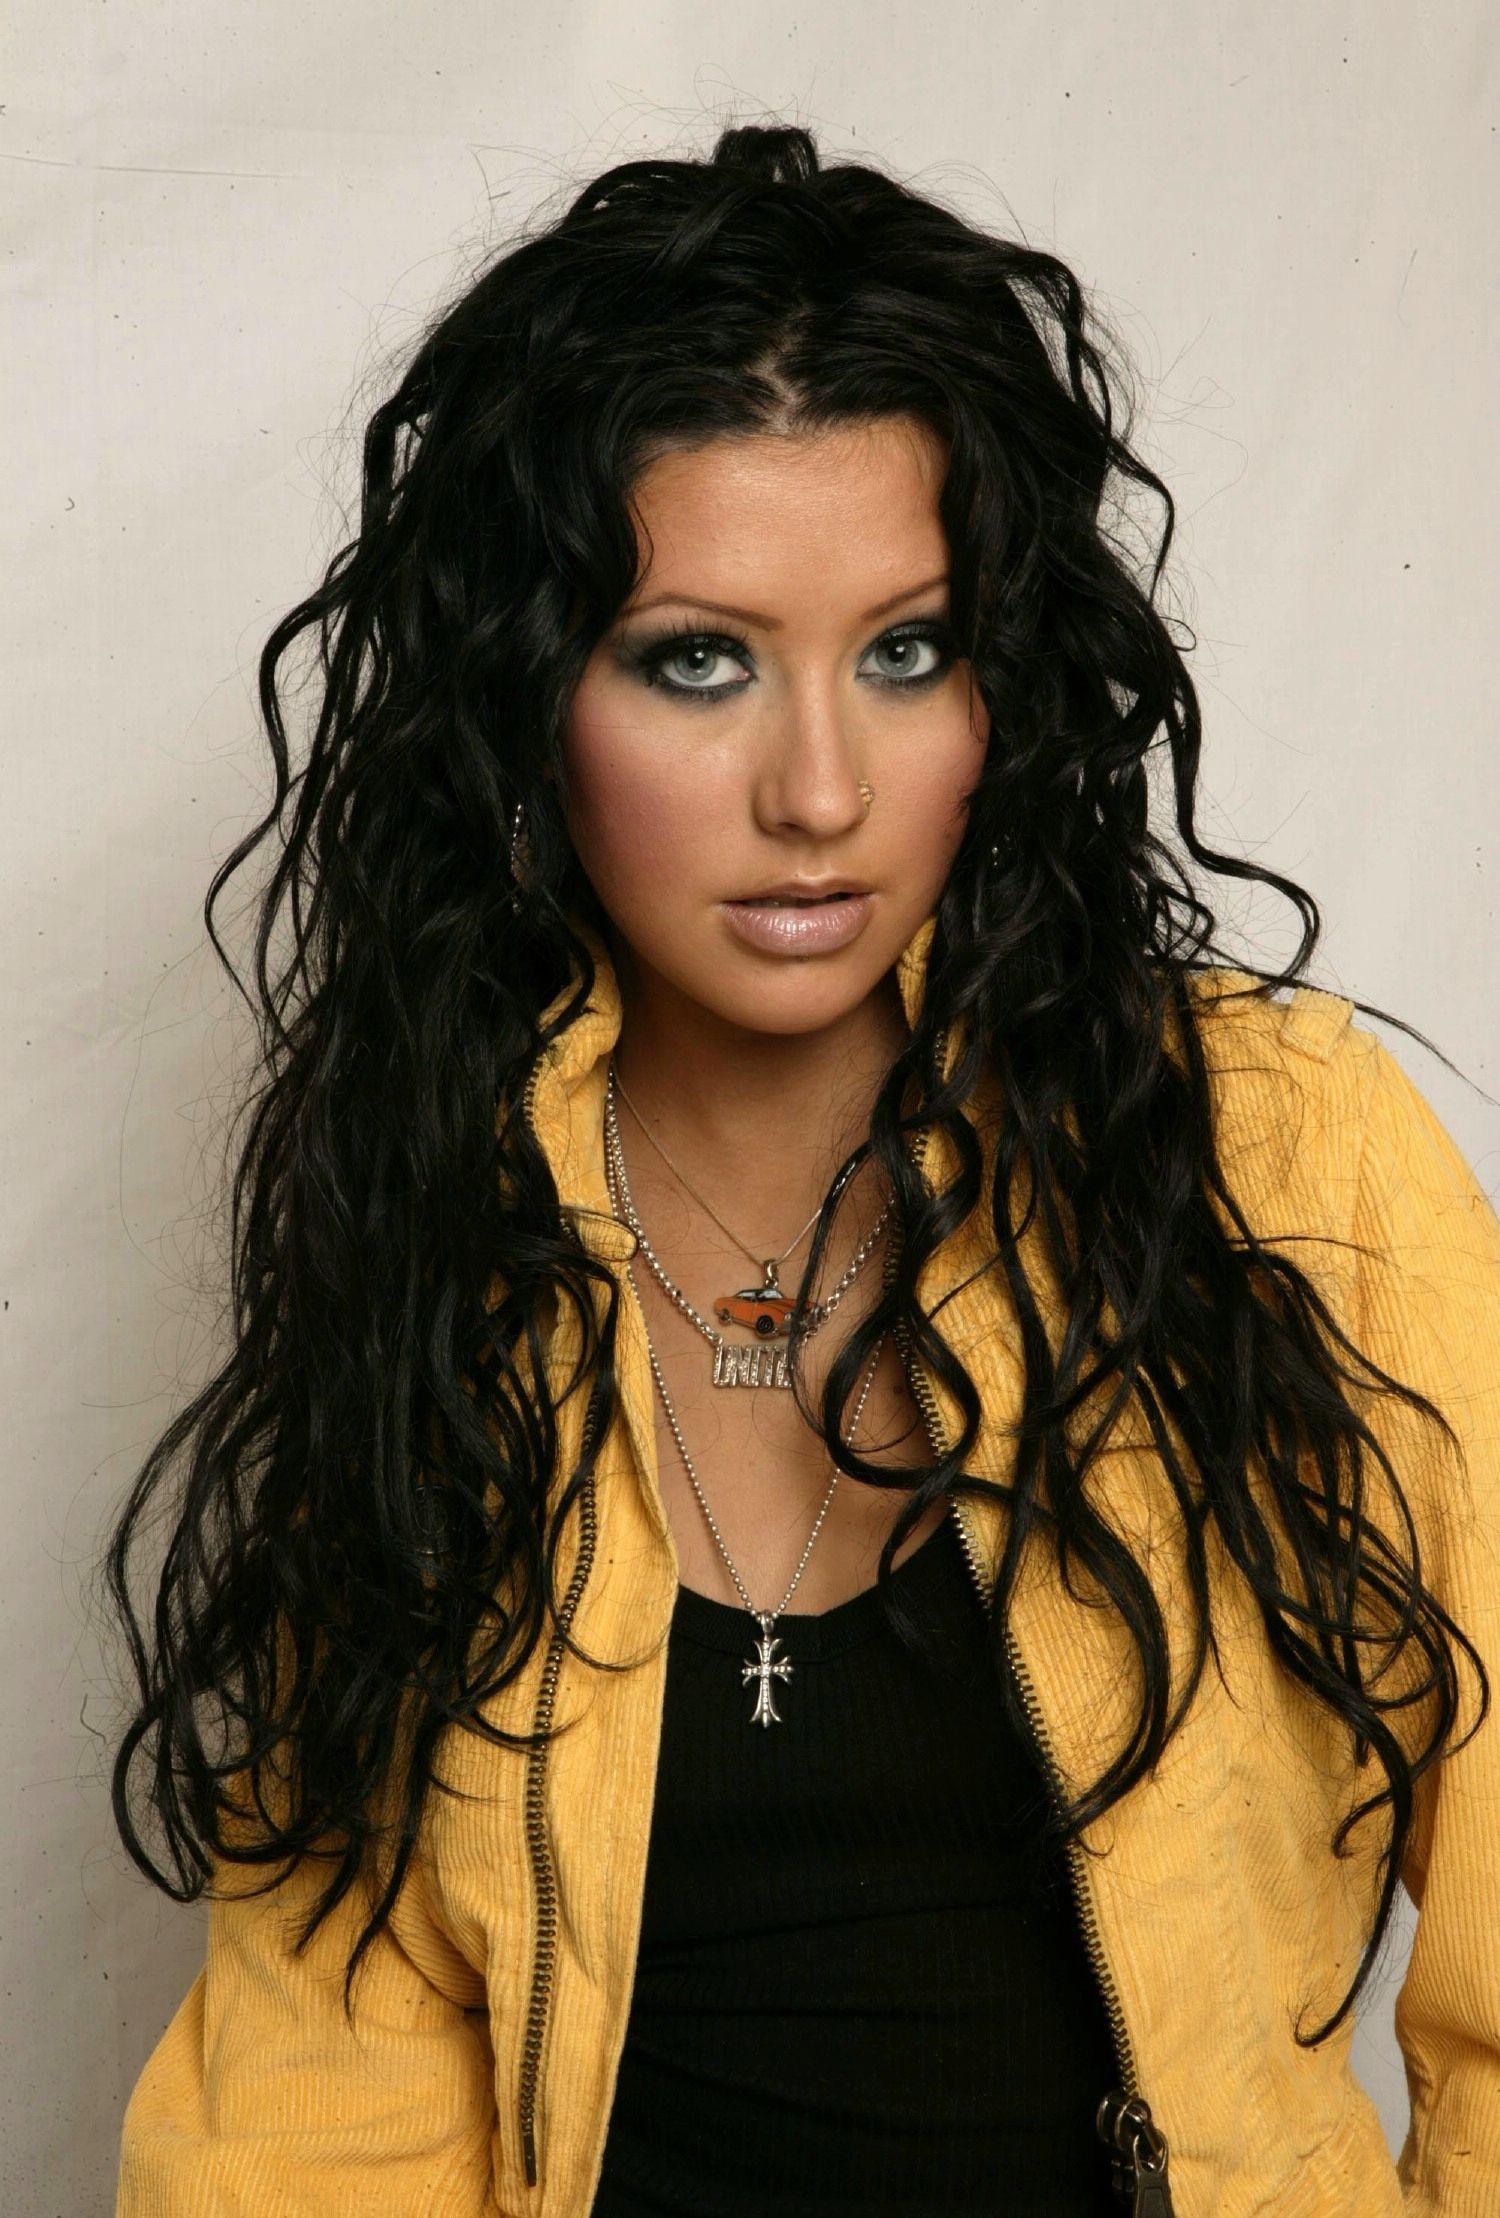 Christina Aguilera Christina Aguilera Hair Christina Aguilera Black Hair Christina Aguilera Stripped